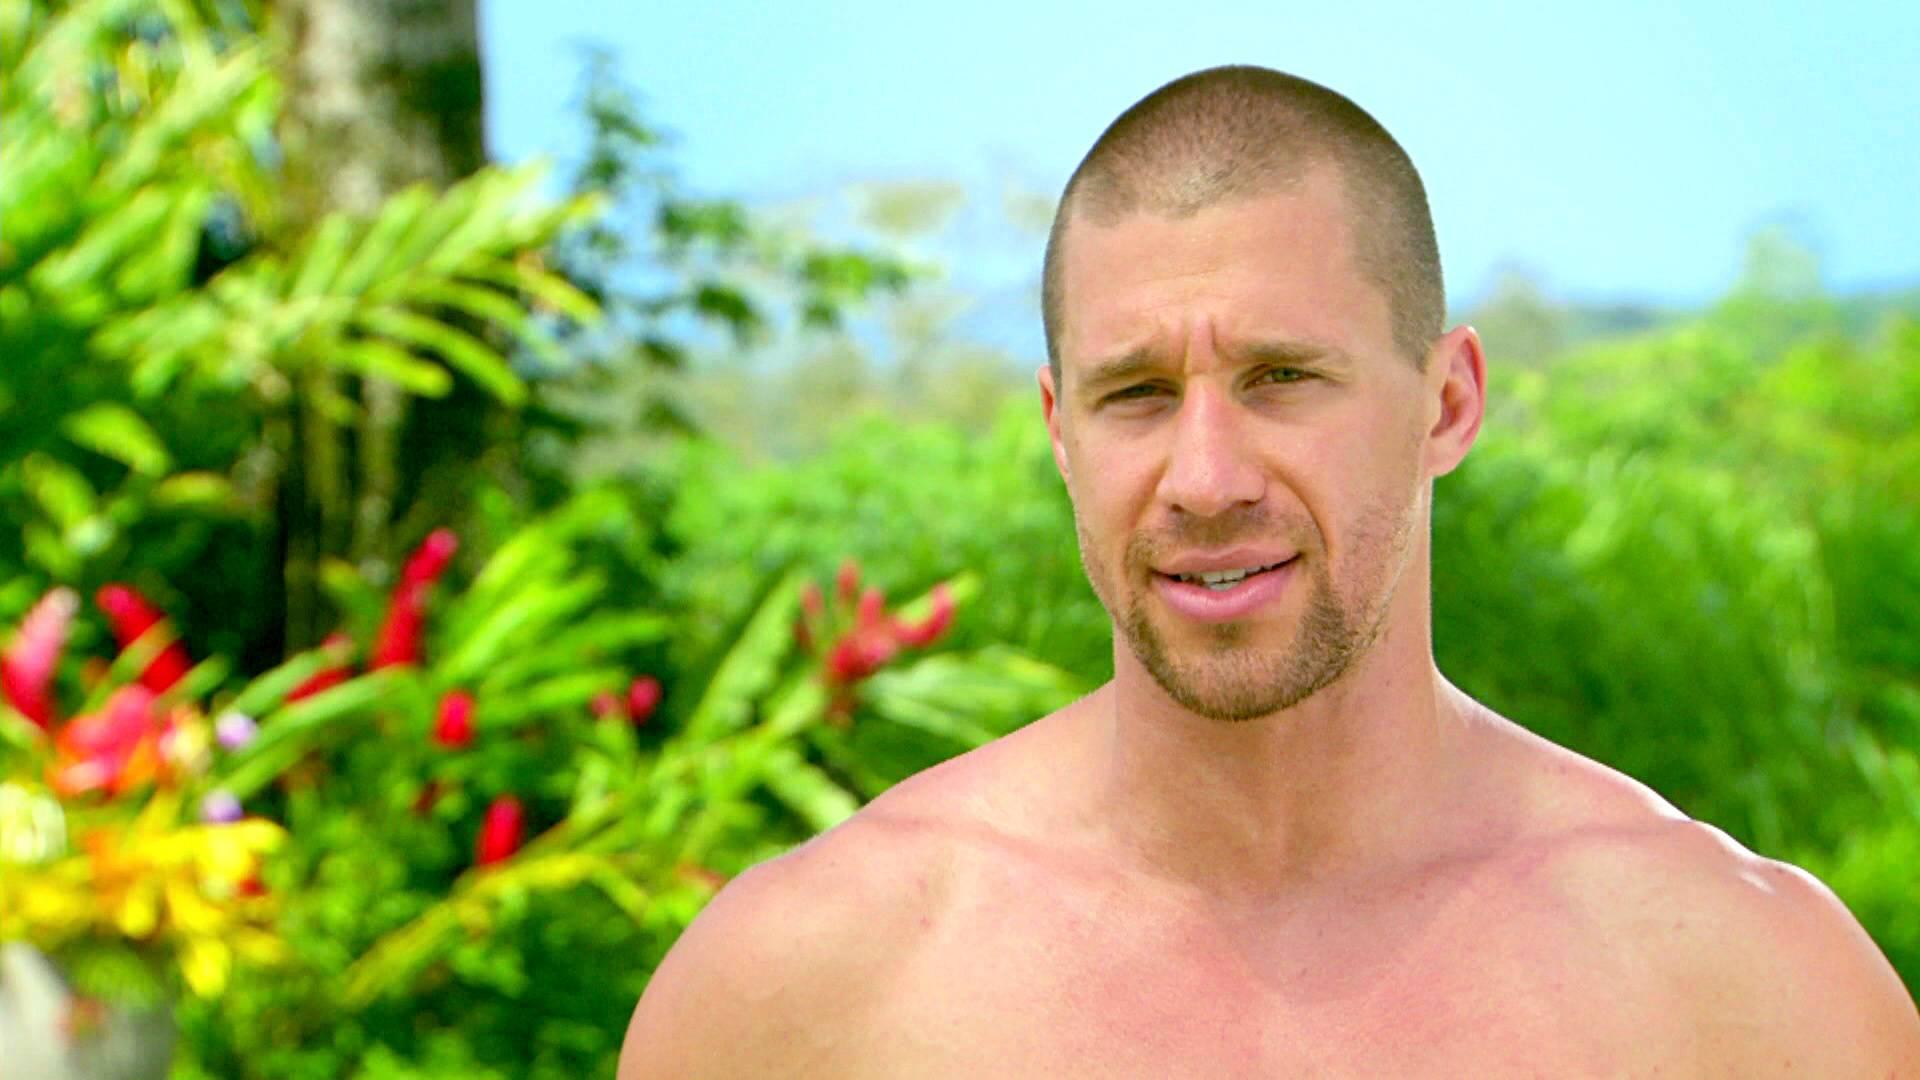 Dating Naked - Staffel 1 im Online Stream | TVNOW